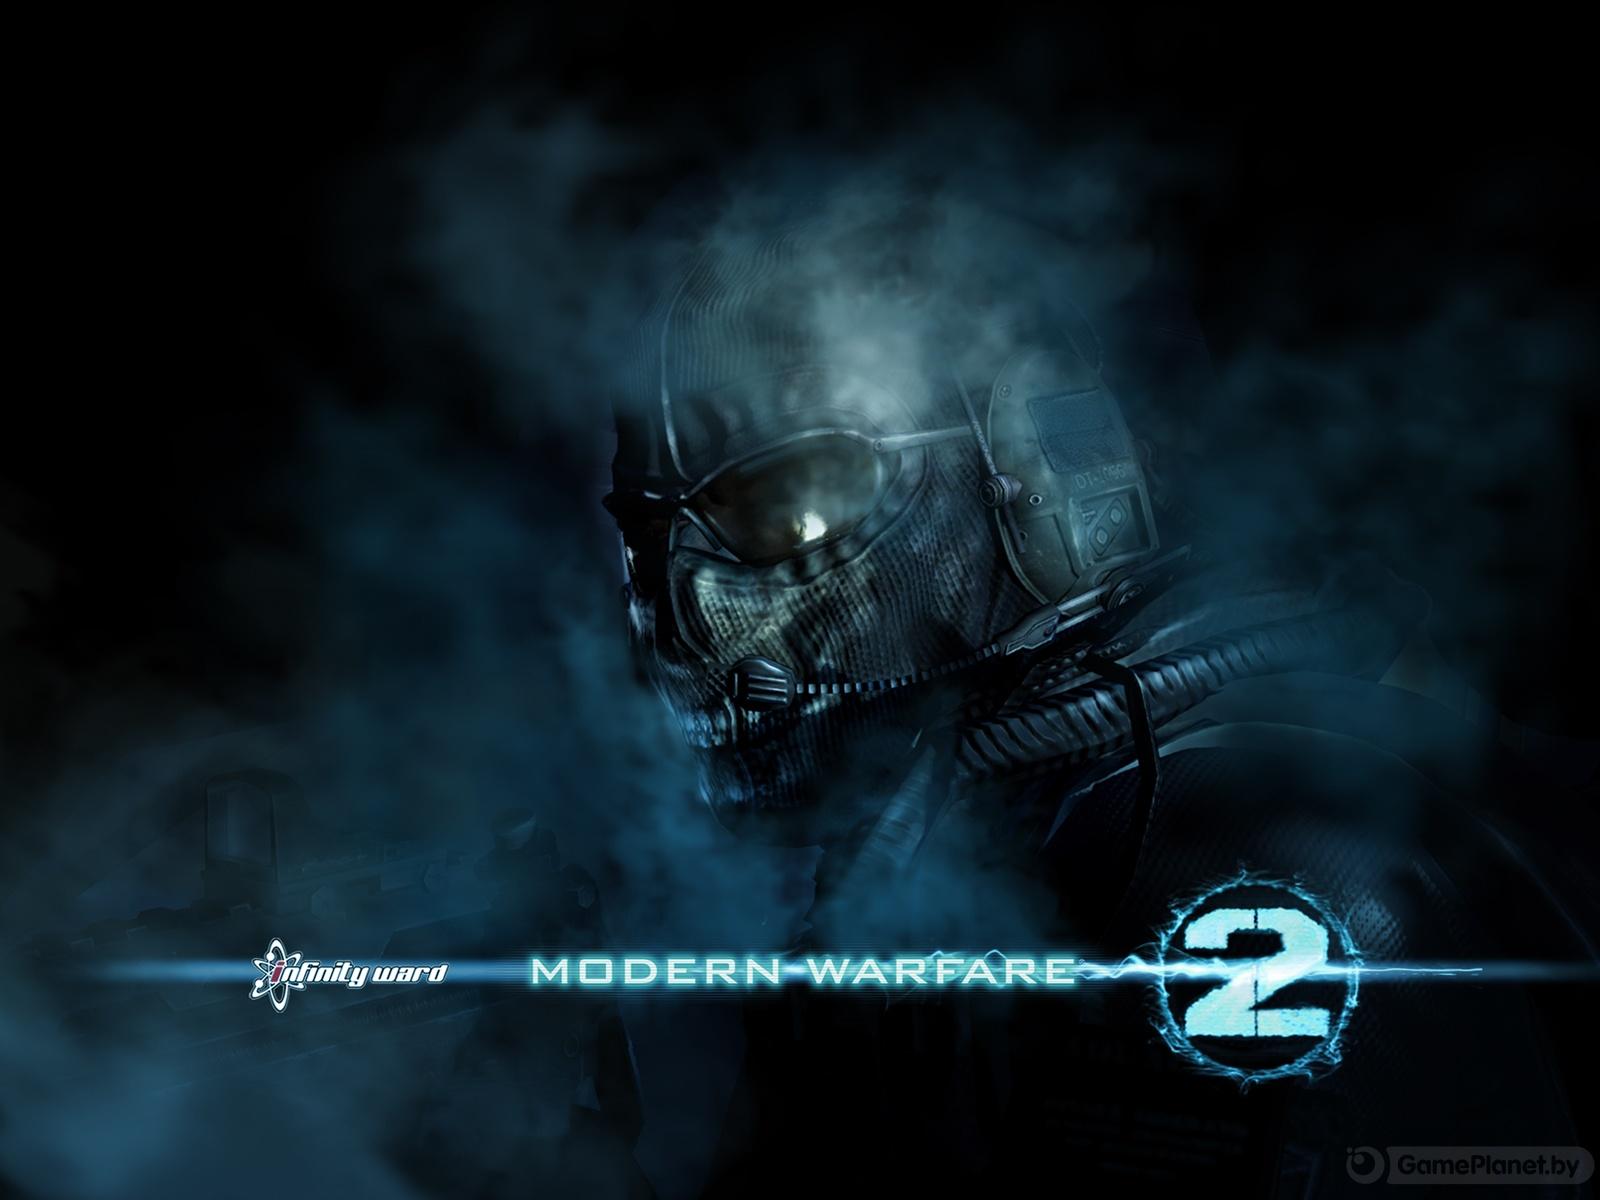 MW 2 - Call of Duty: Modern Warfare 2